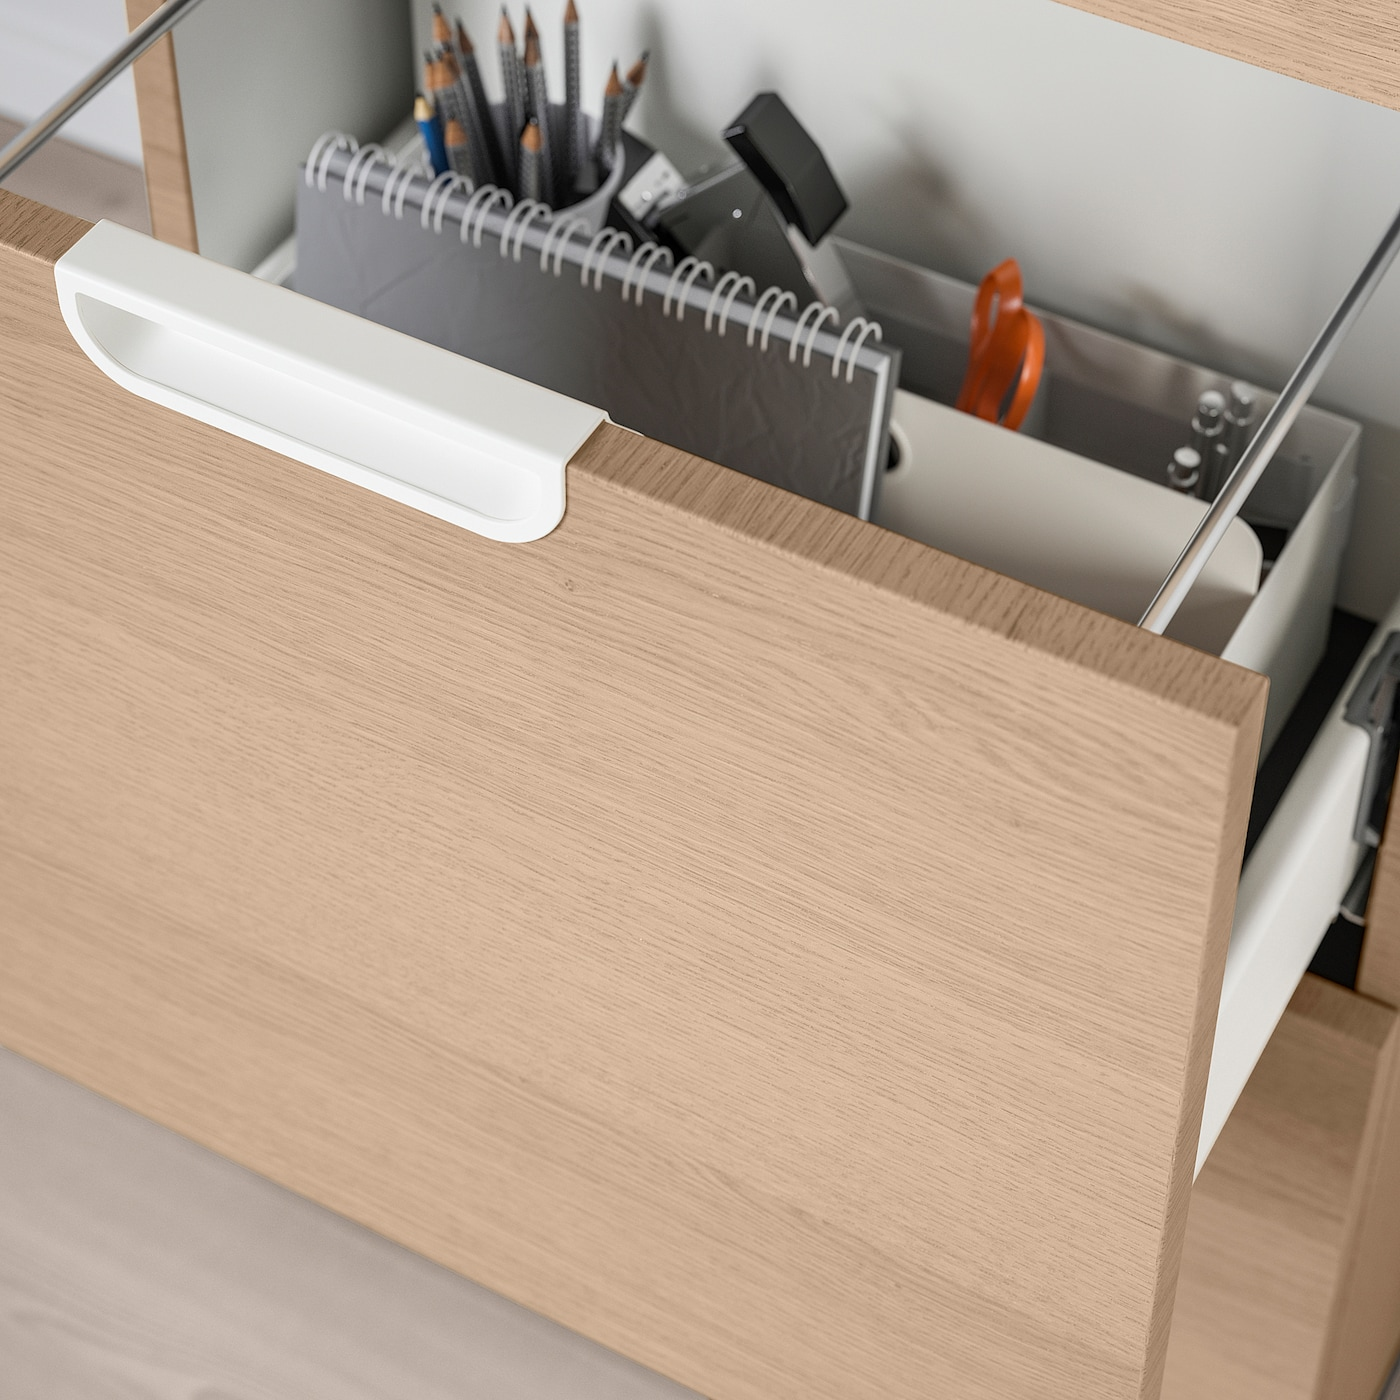 Galant File Cabinet White Stained Oak Veneer 20 1 8x47 1 4 Ikea